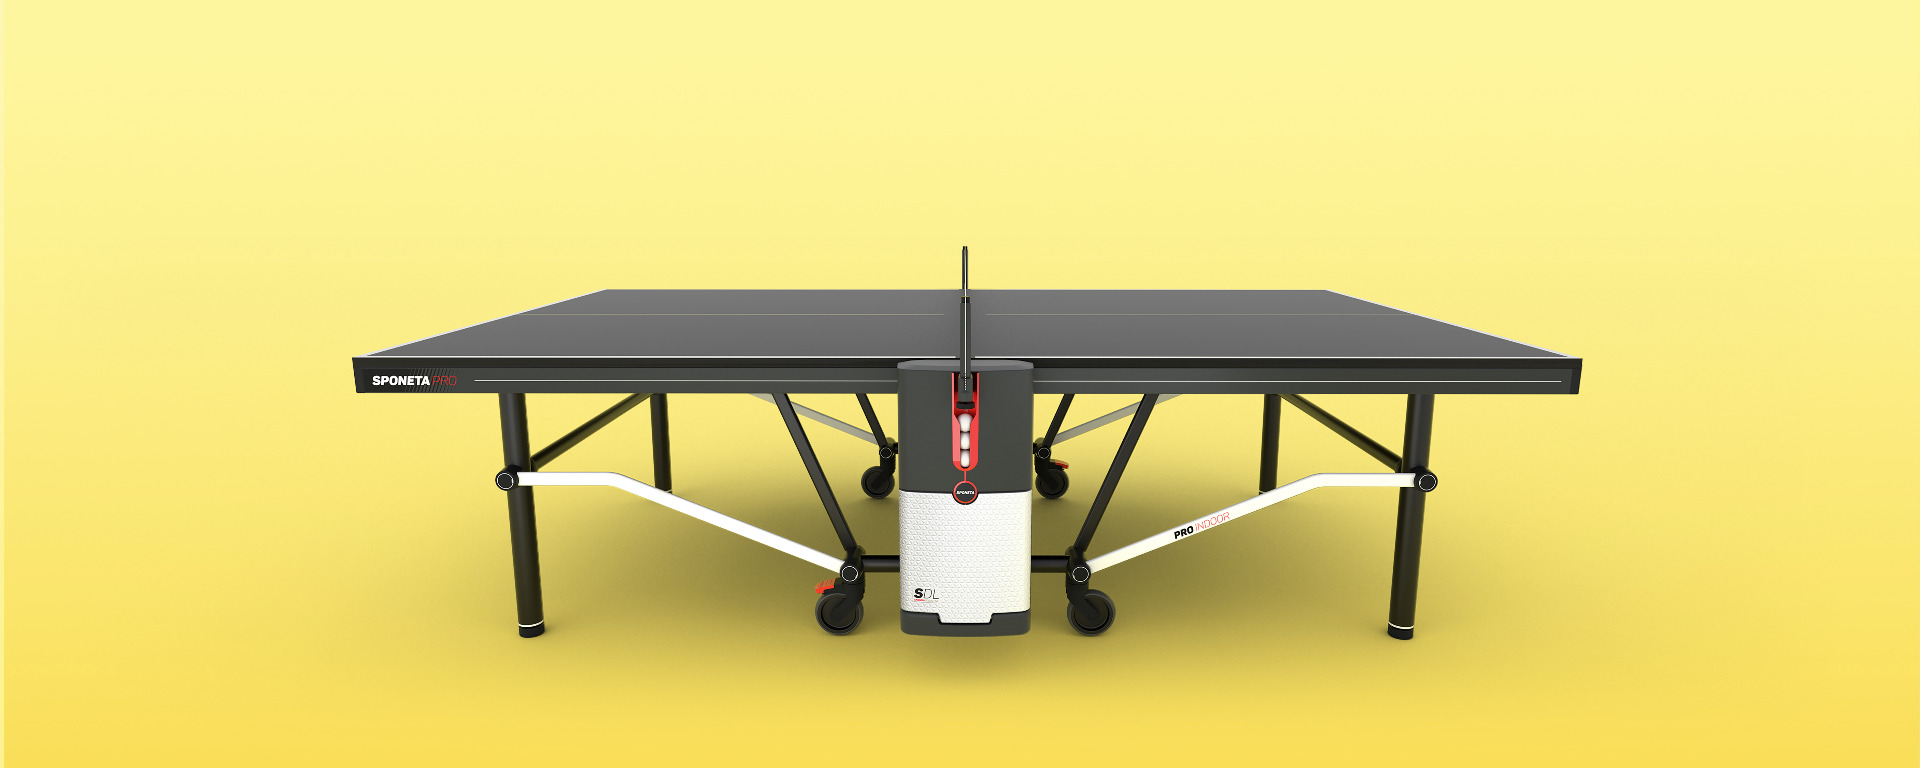 sponeta sdl tafeltennistafel indoor pro edition